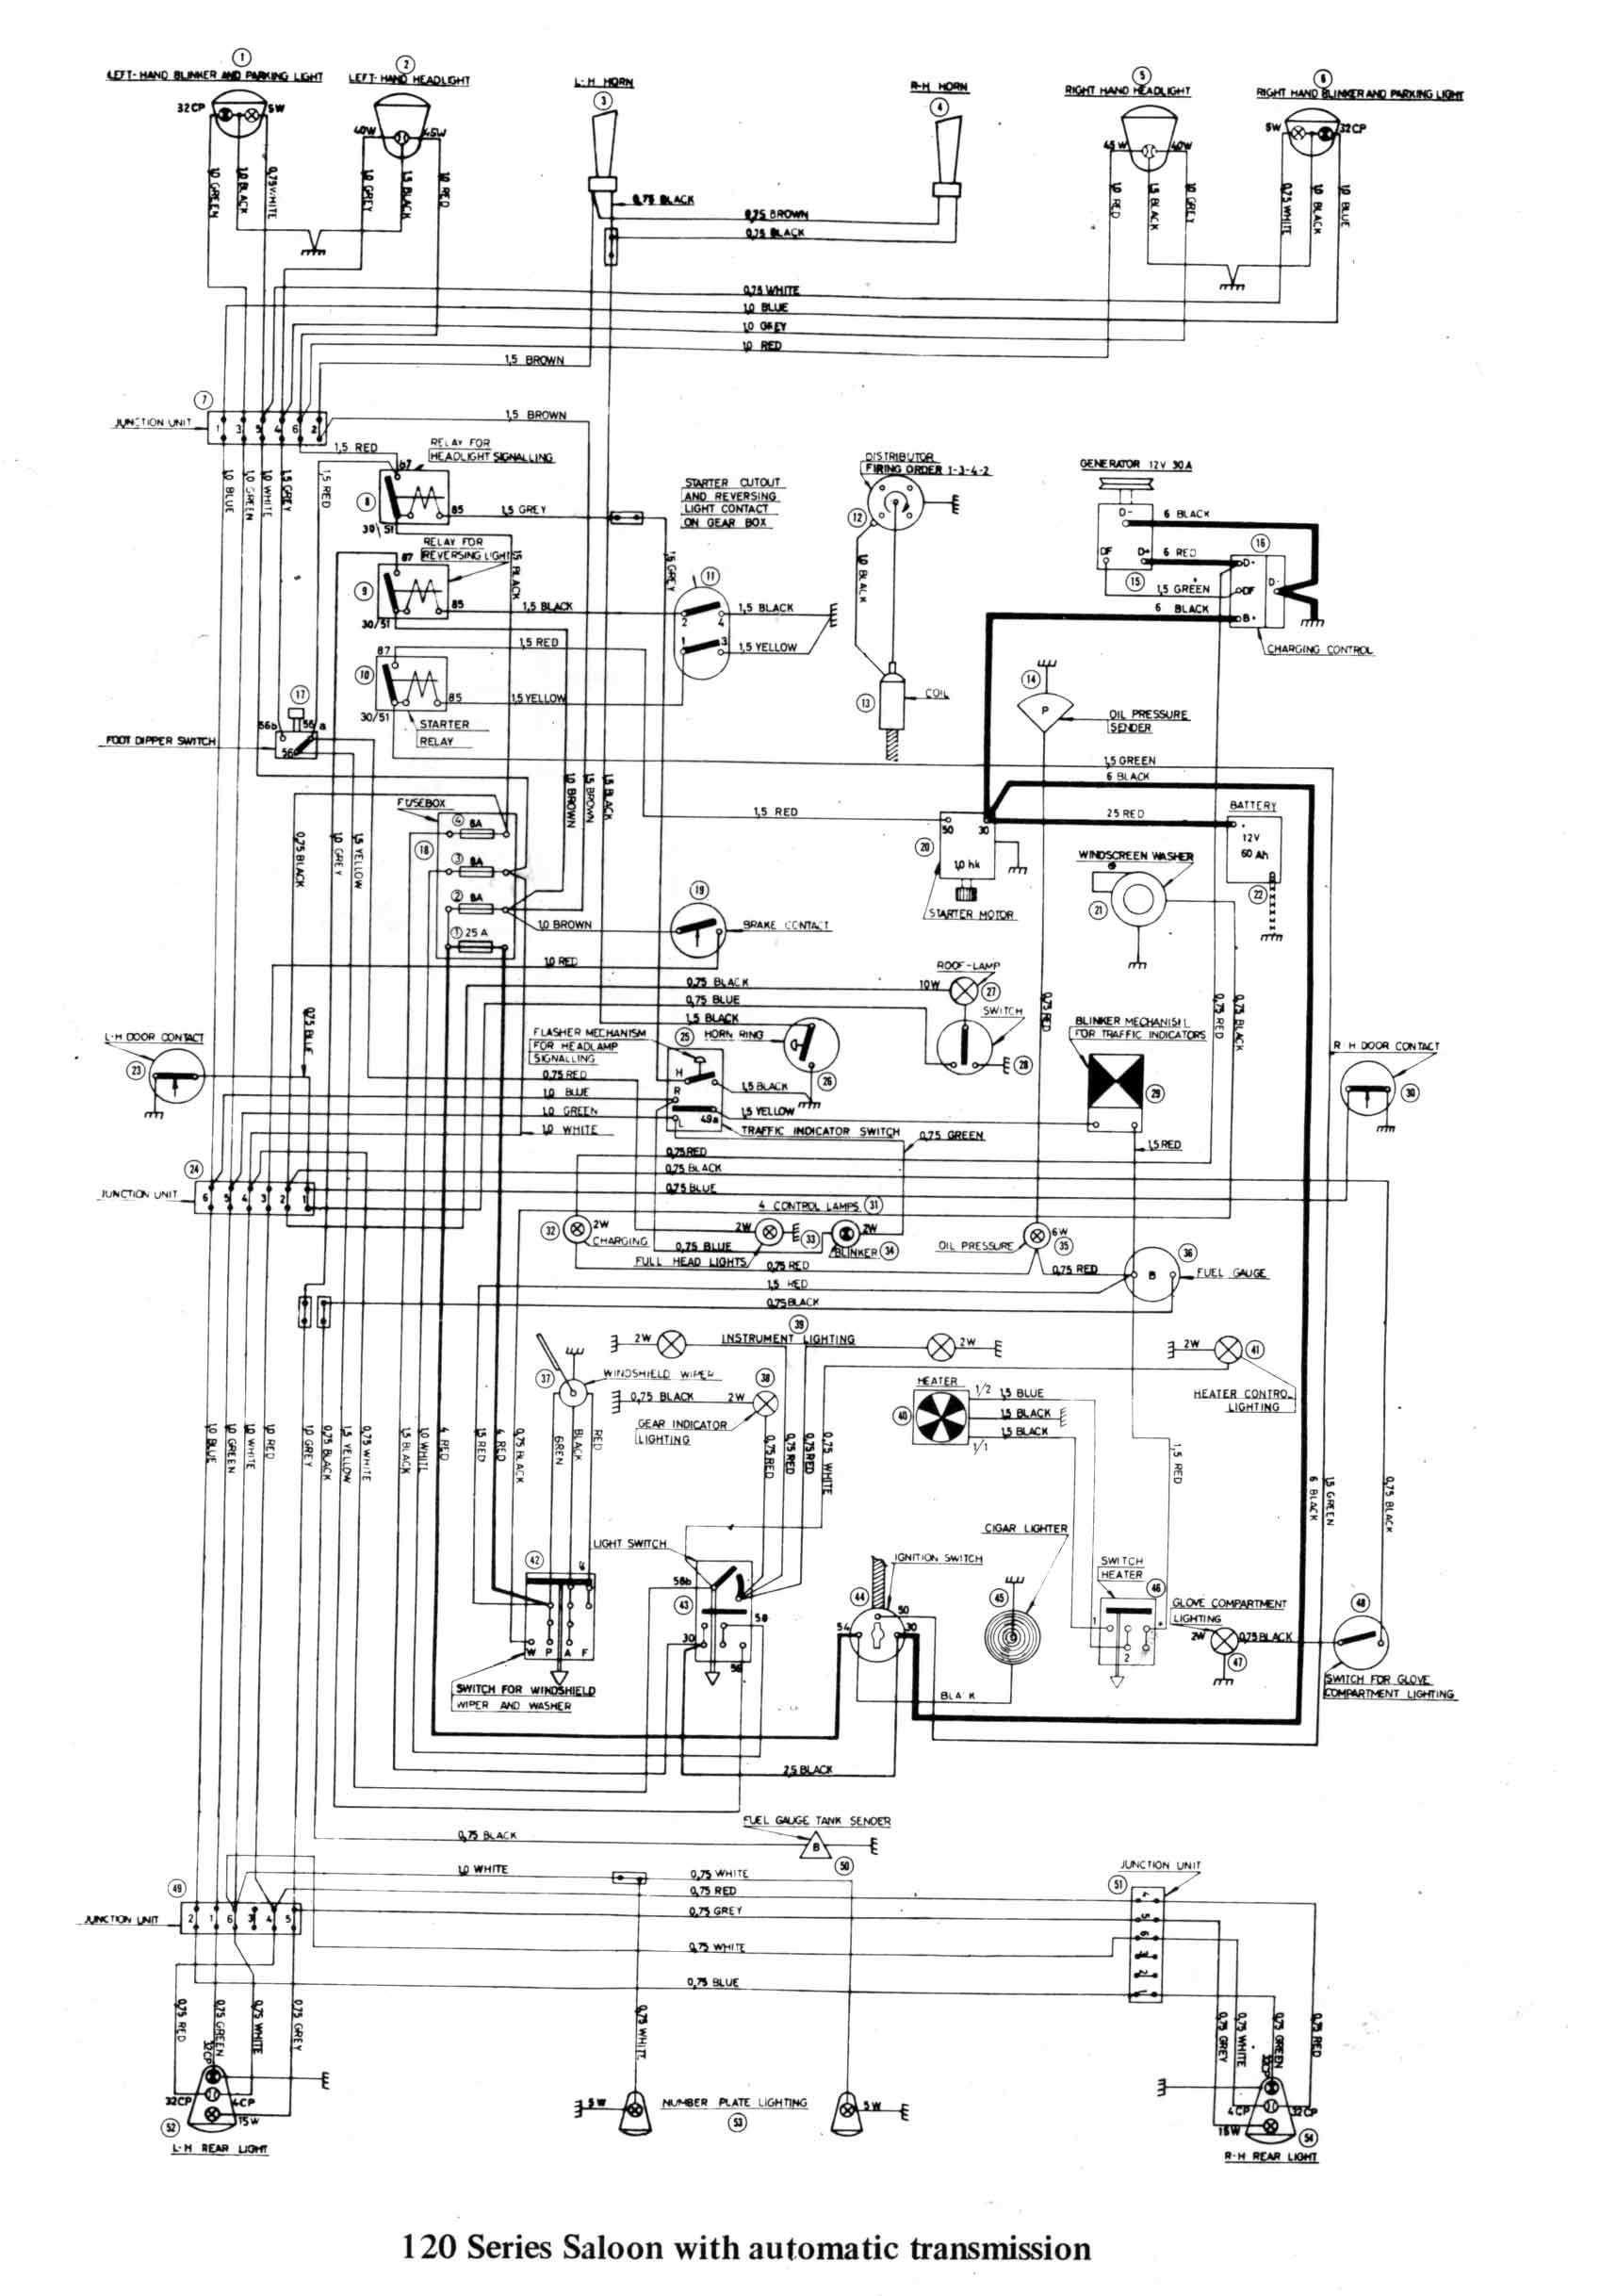 Power Wheels Wiring Diagram